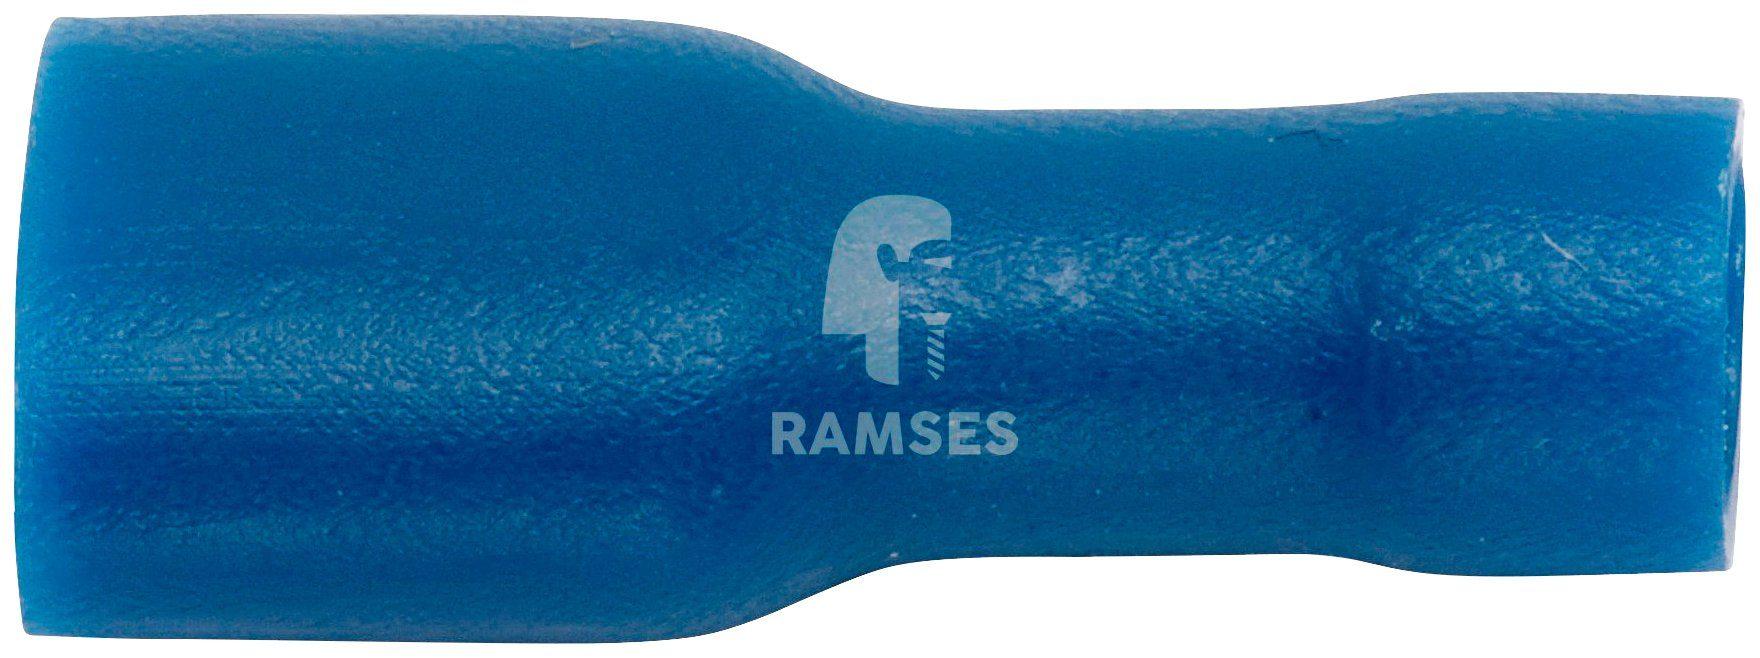 RAMSES Flachsteckhülsen , vollisoliert blau 1,5 - 2,5 mm² 6,3 x 0,8 100 Stück